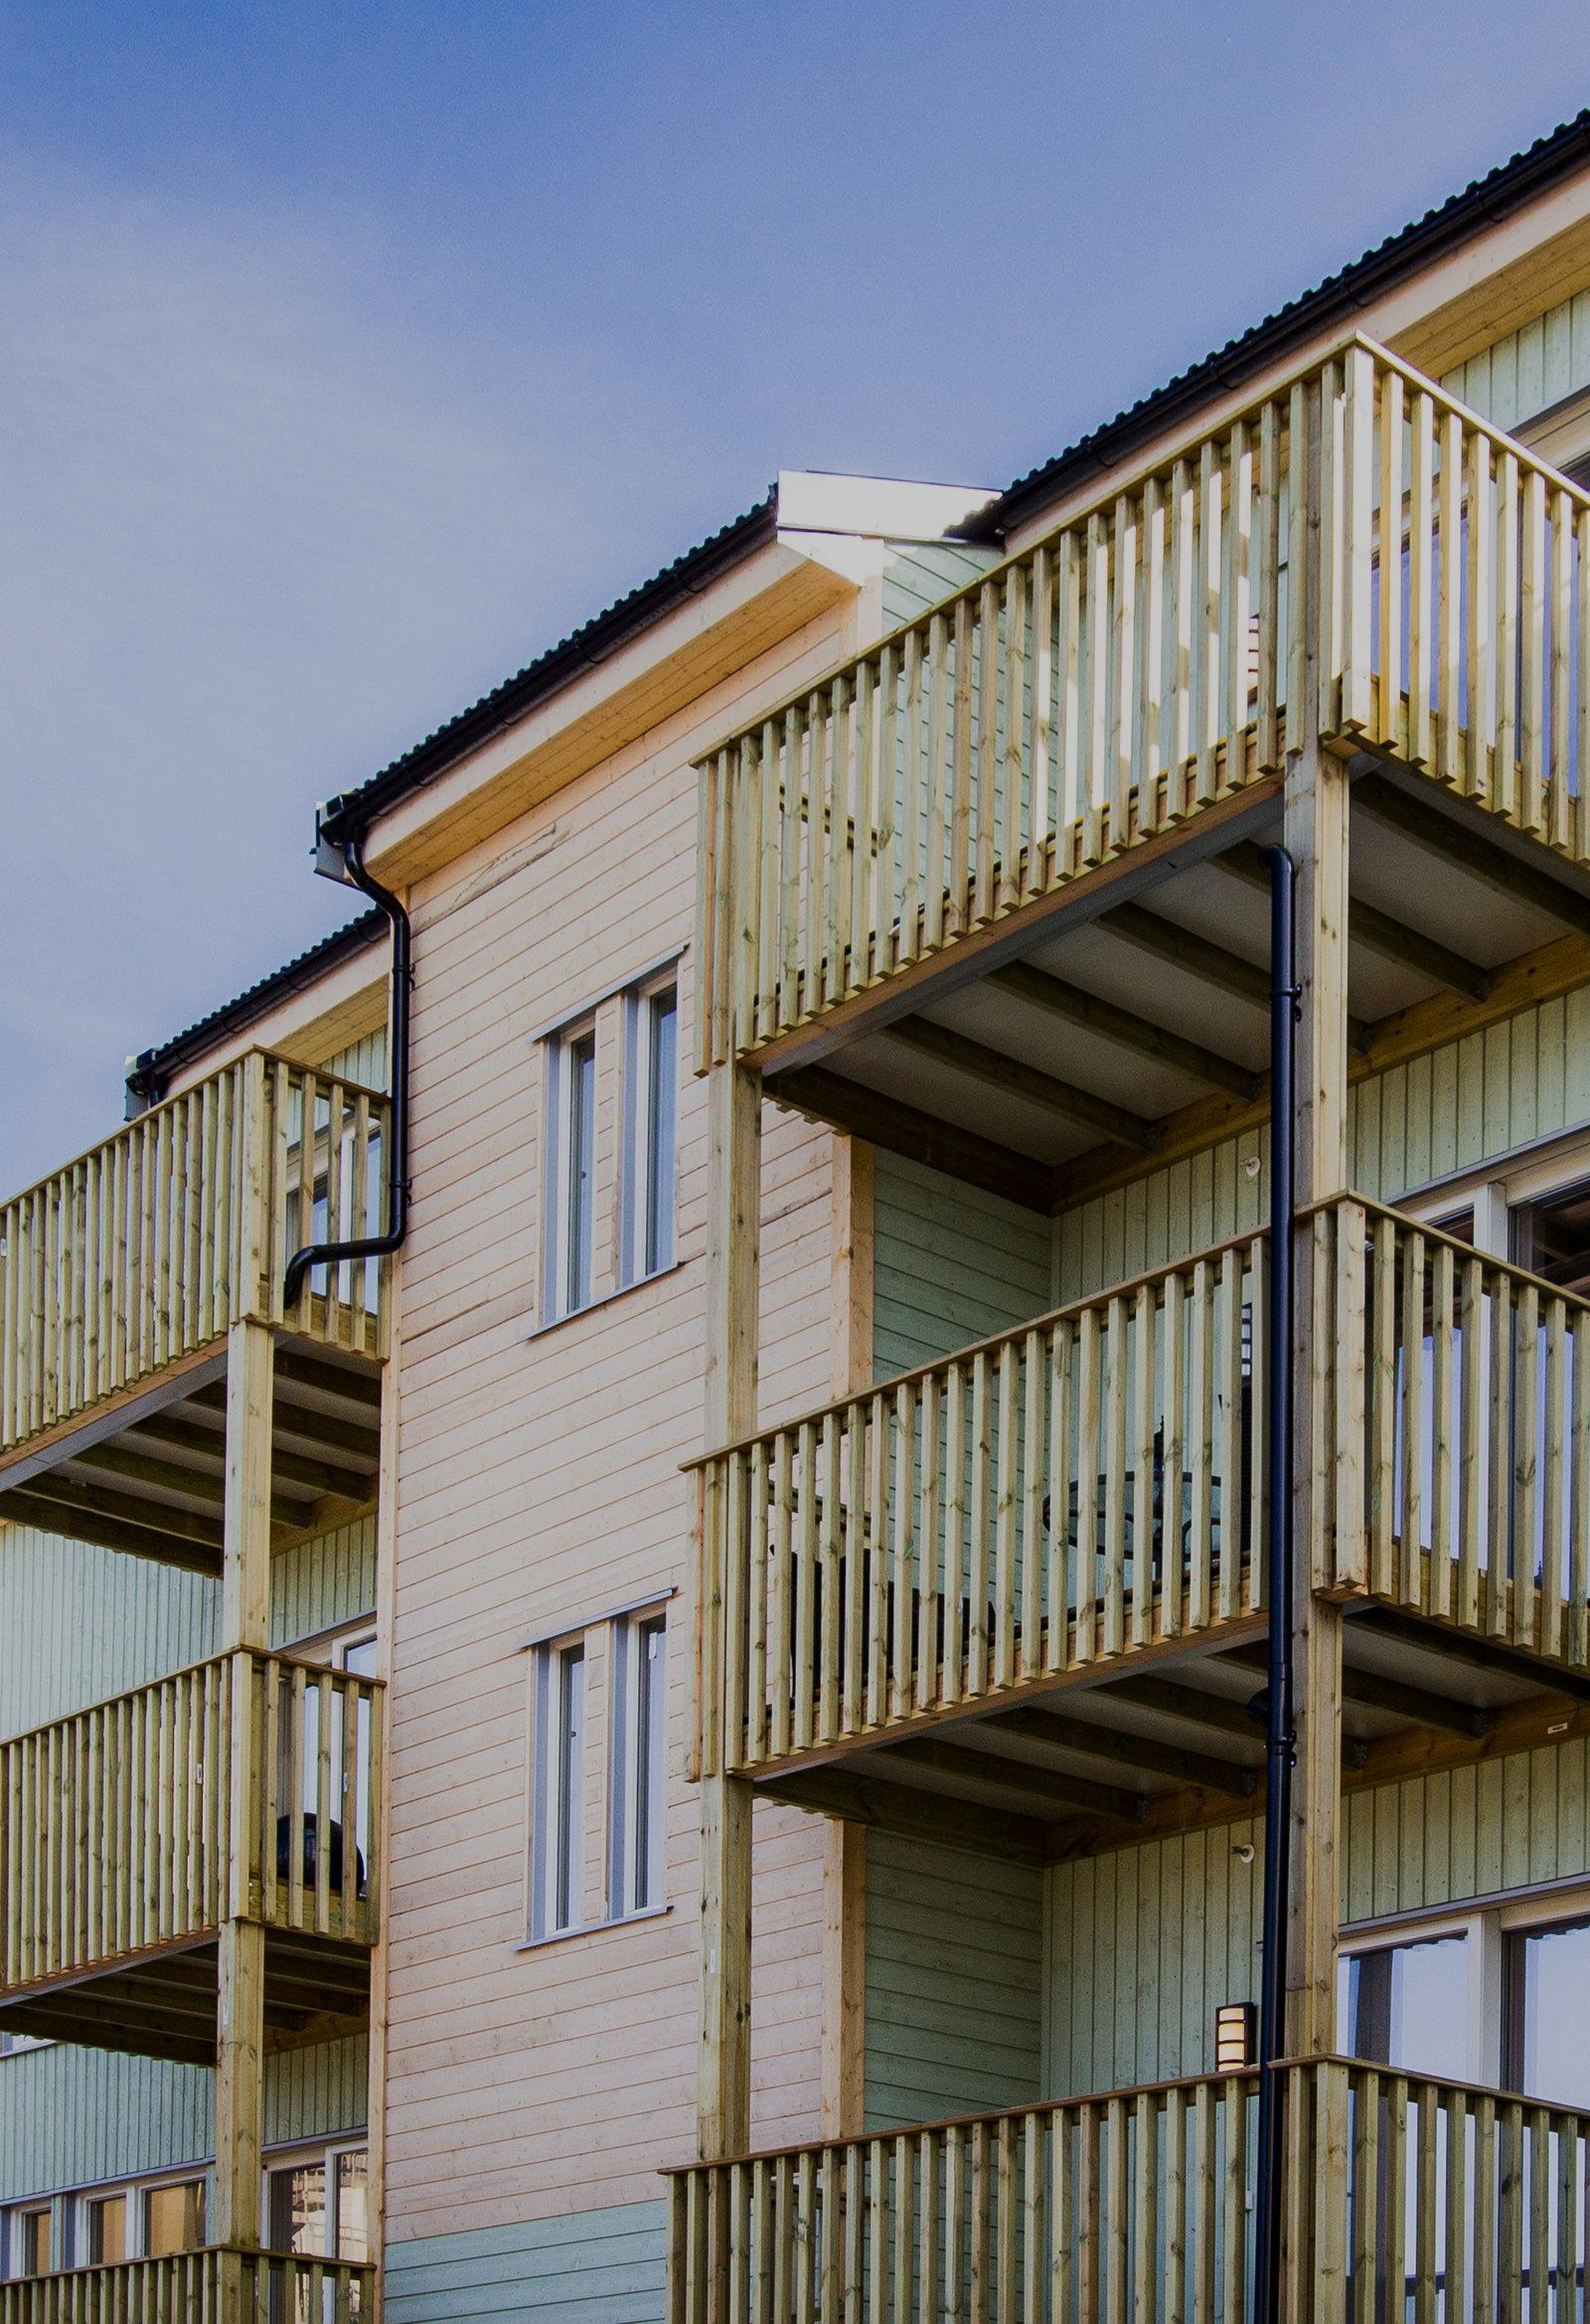 Fredrikstad Næringsbygg